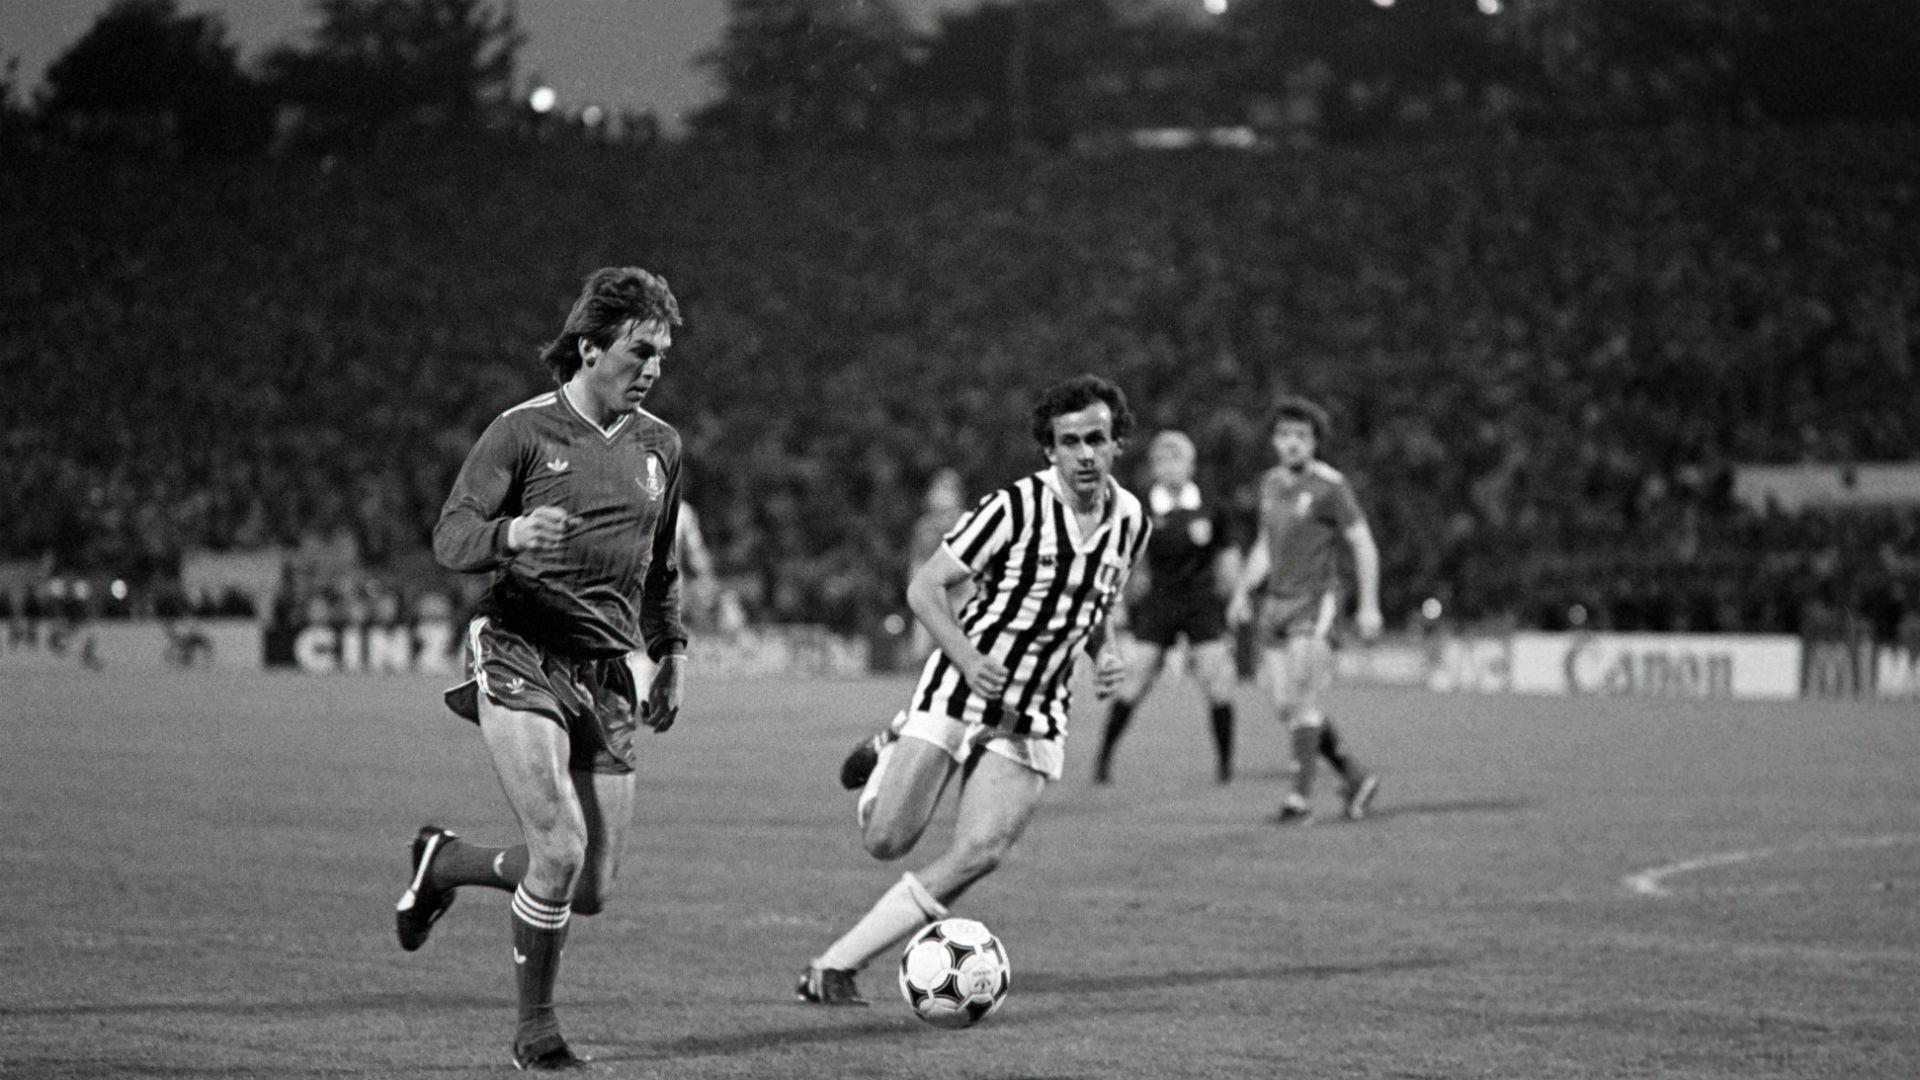 Liverpool Juventus Michel Platini European Cup 1985 Heysel